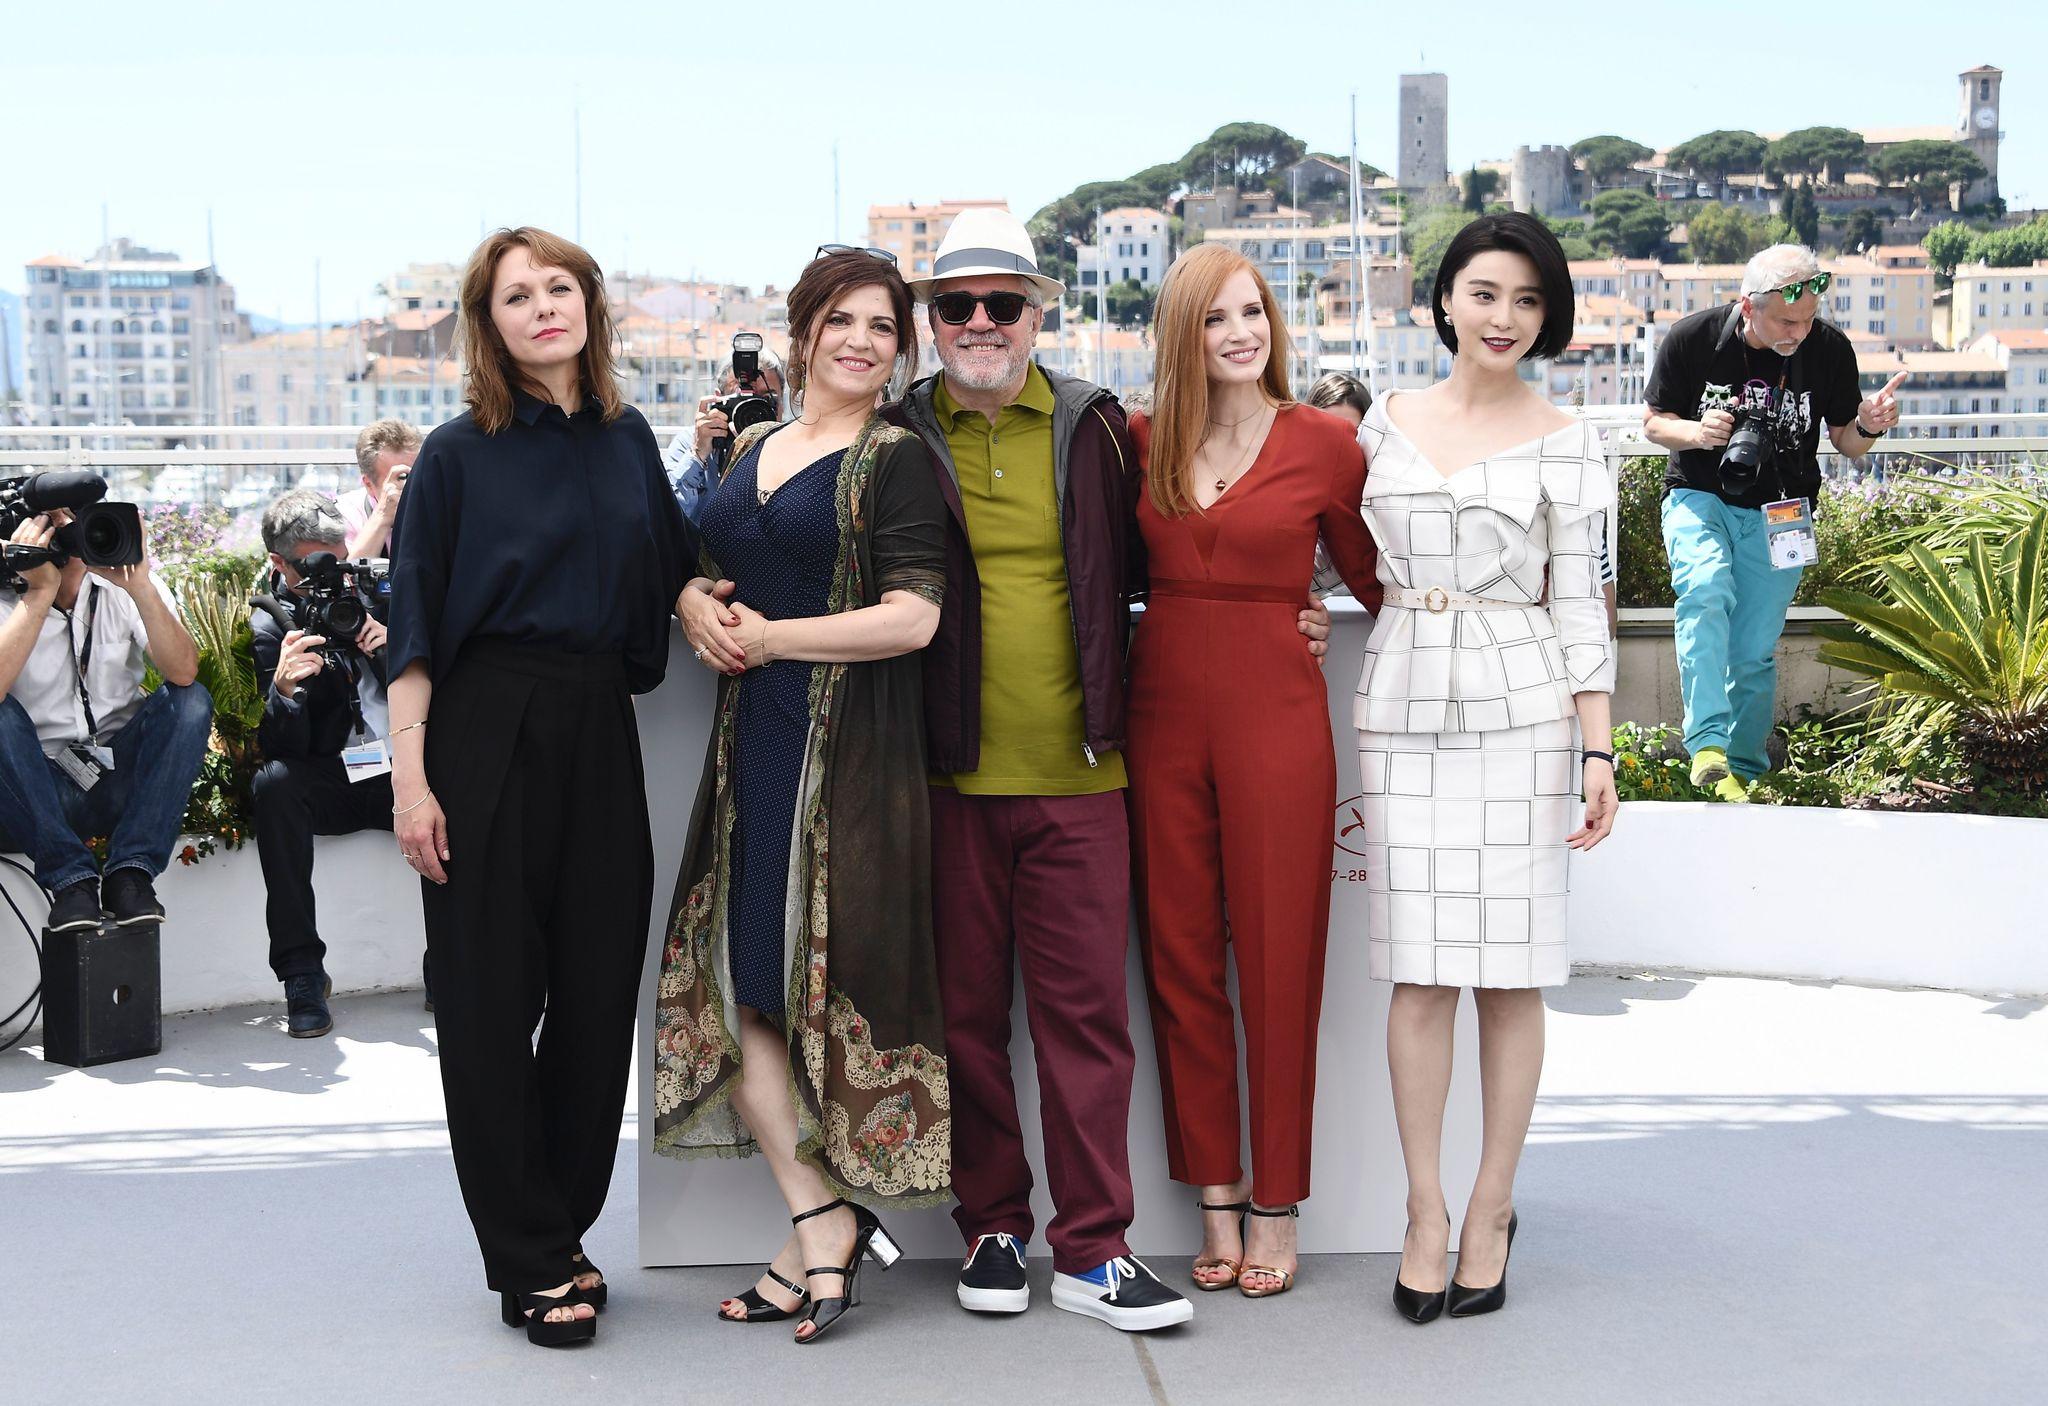 Pedro Almodóvar, Maren Ade, Agnès Jaoui, Bingbing Fan, and Jessica Chastain